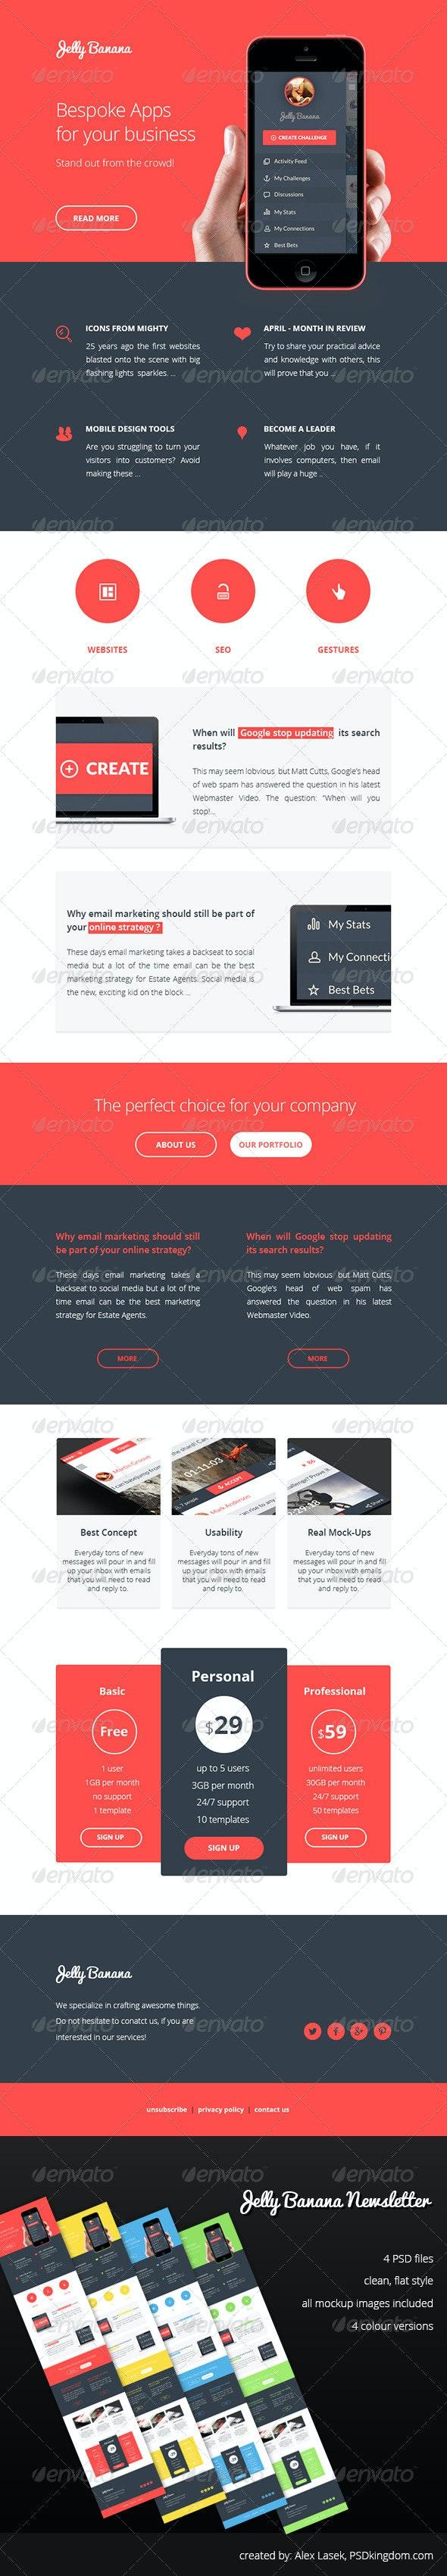 Jelly Banana Flat eNewstetter Design Template  - E-newsletters Web Elements